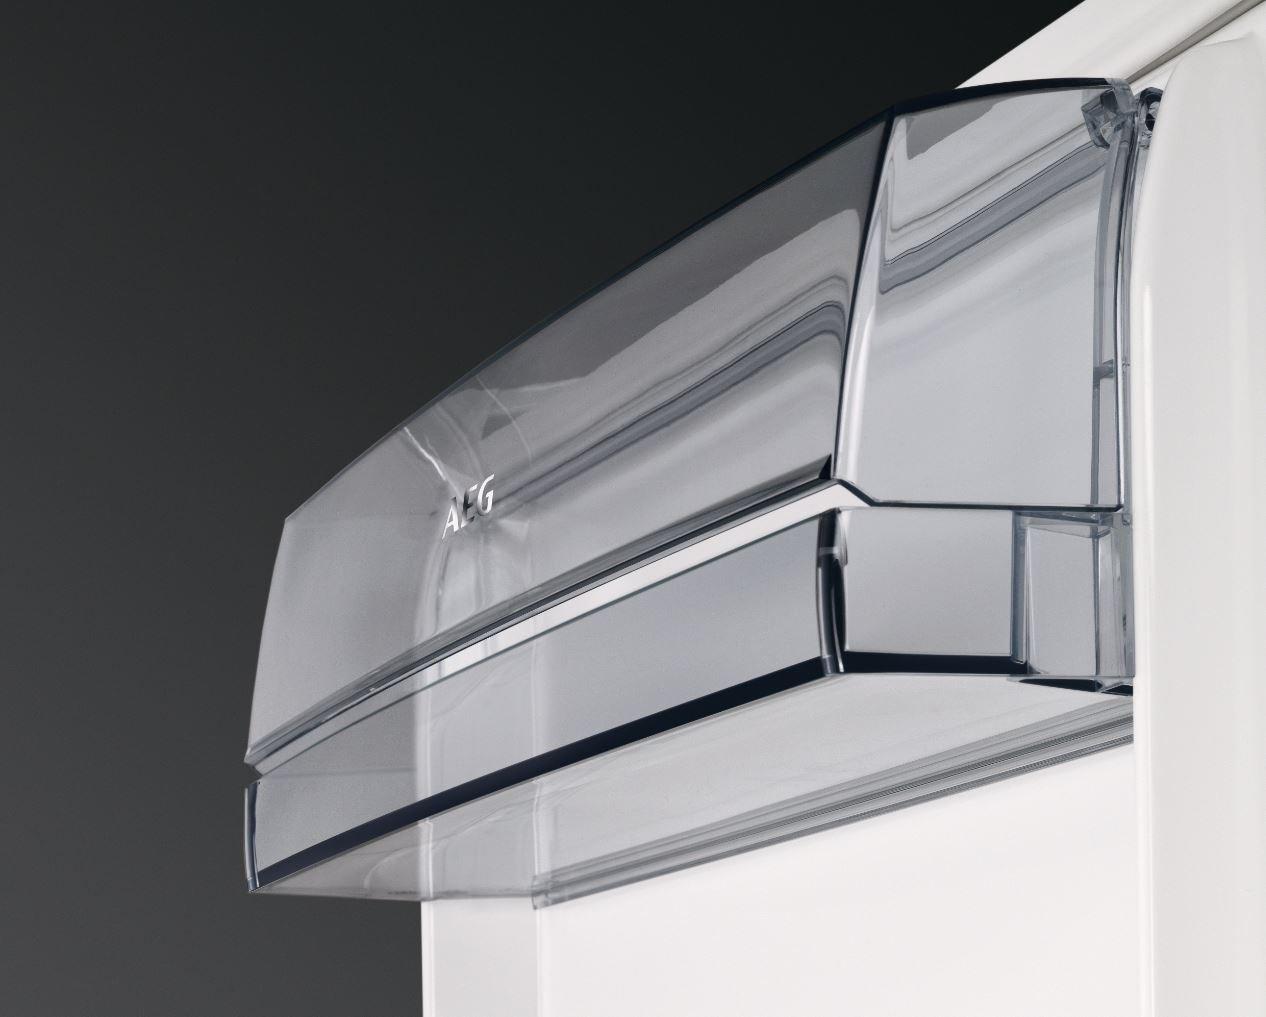 Aeg Kühlschrank Rtb91431aw : Aeg sfb as kühlschrank vollintegrierbar weiß a